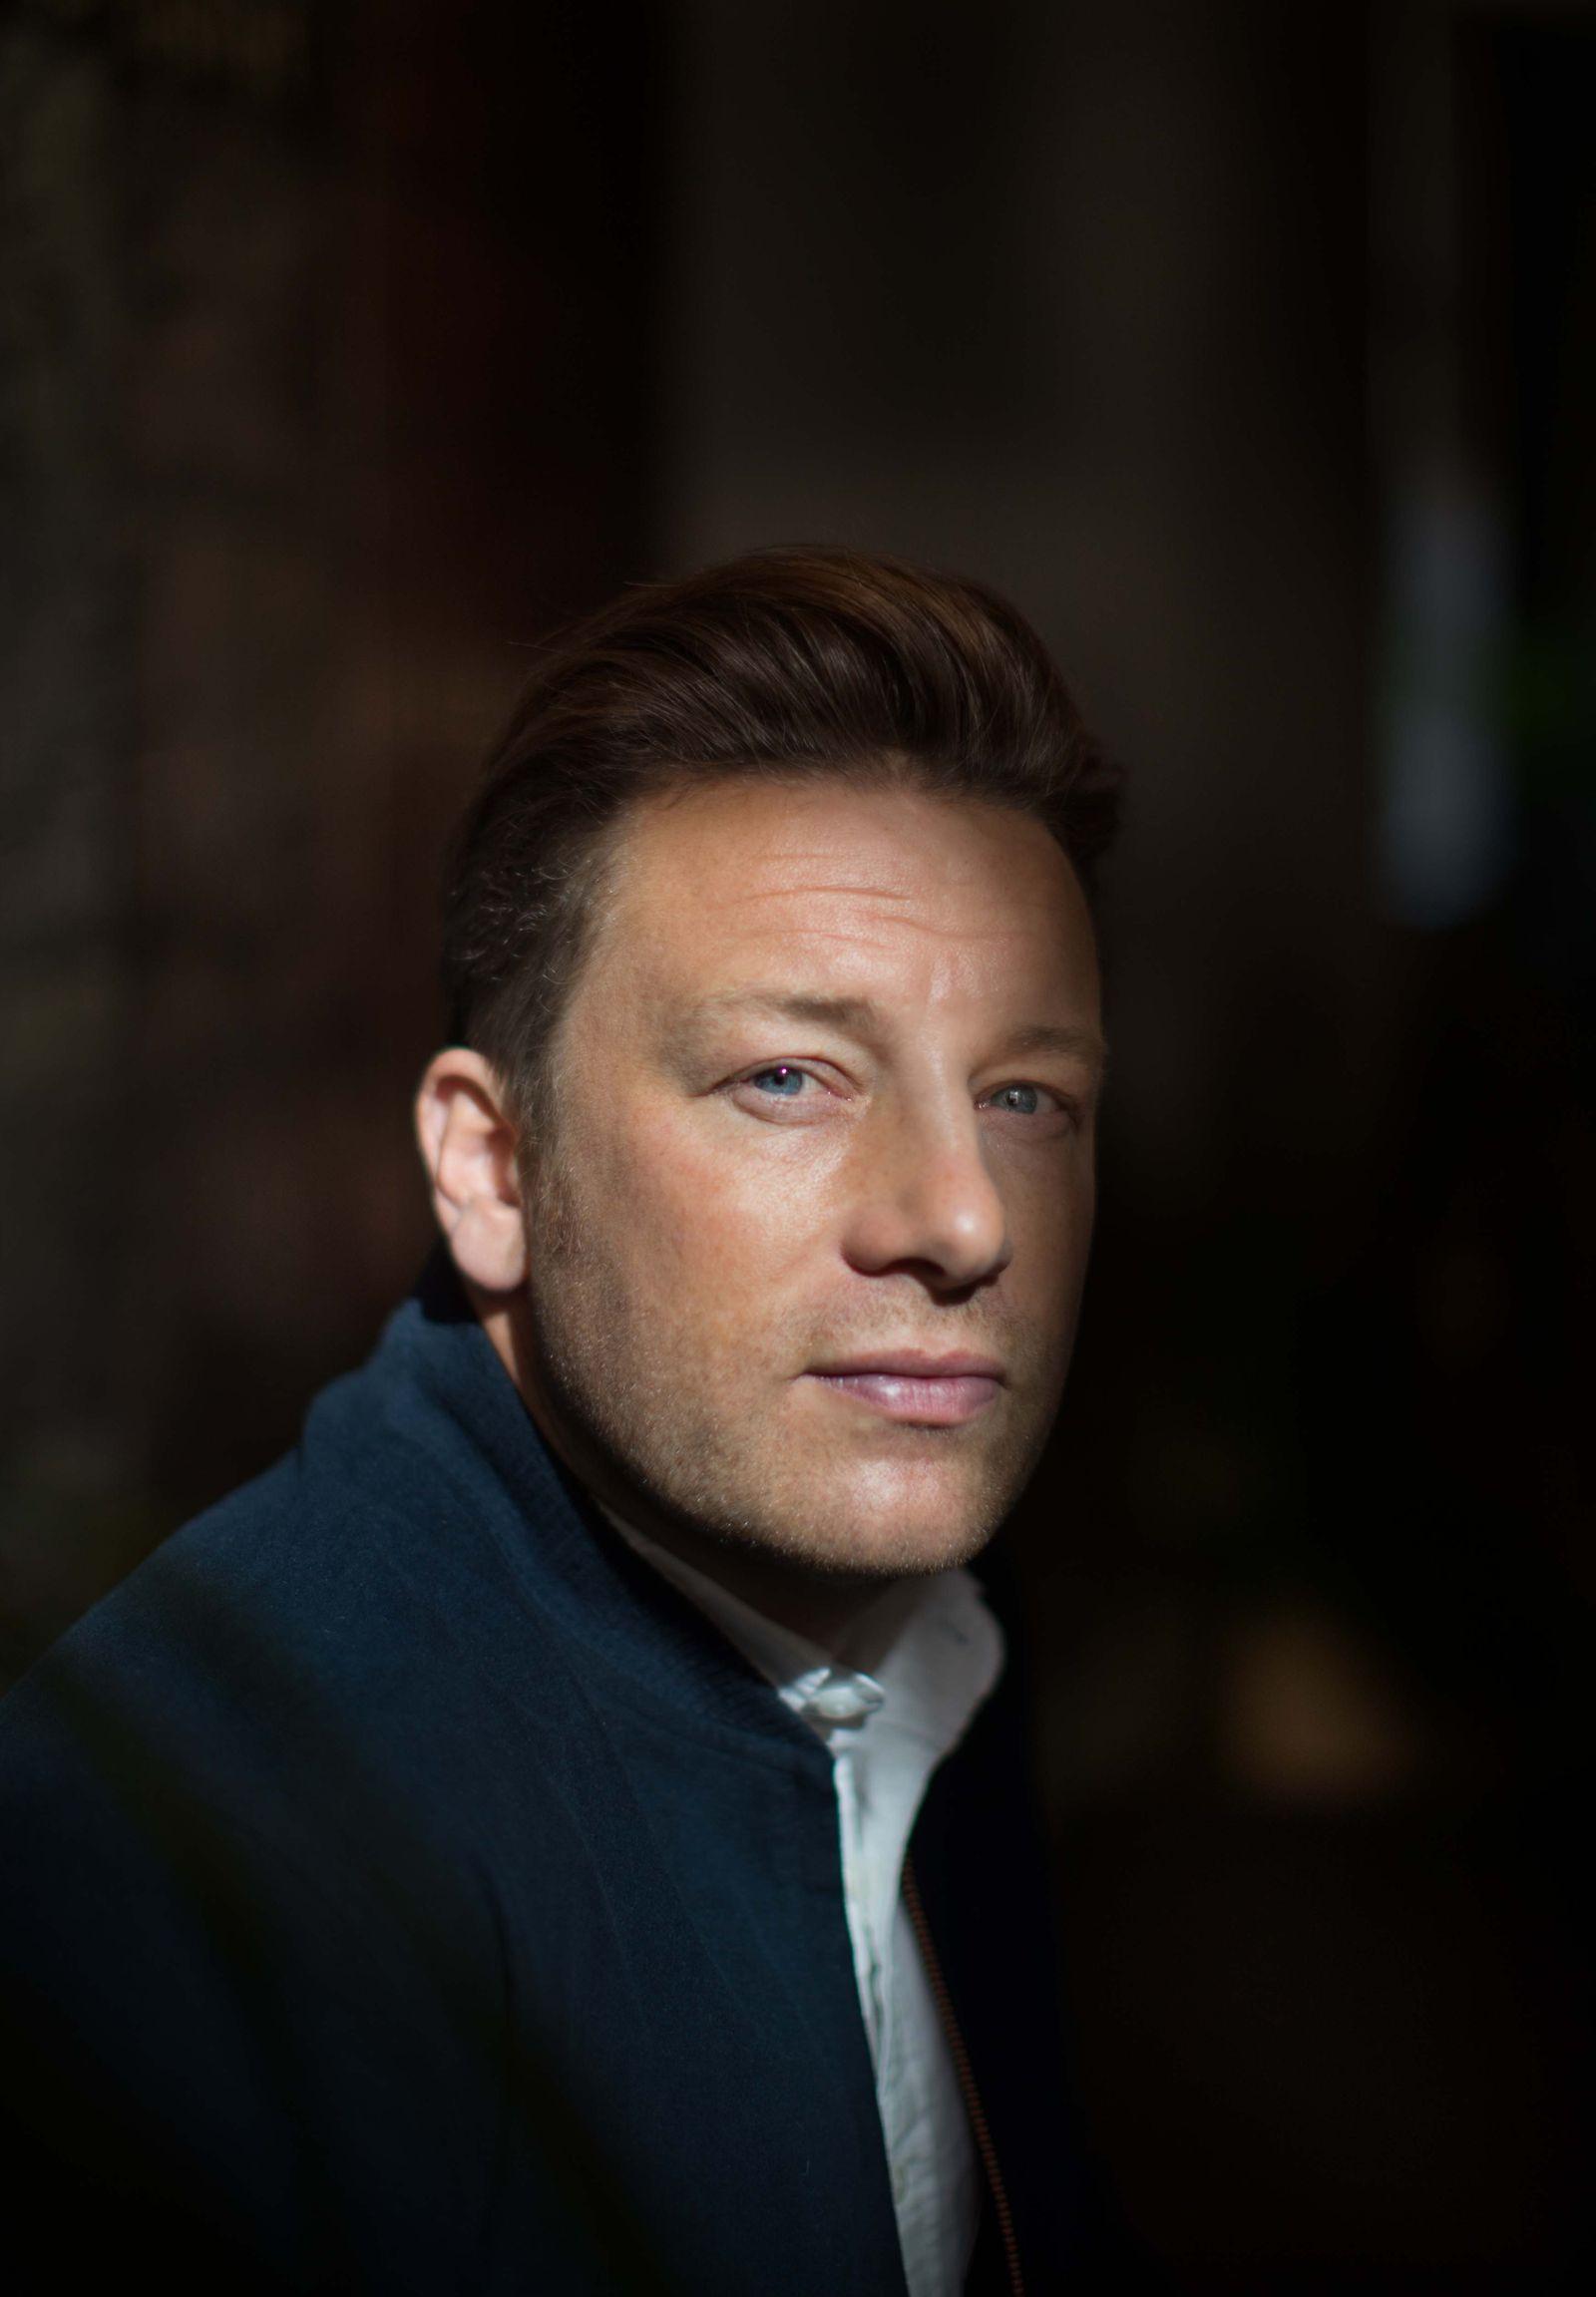 Jamie Oliver by Headpress